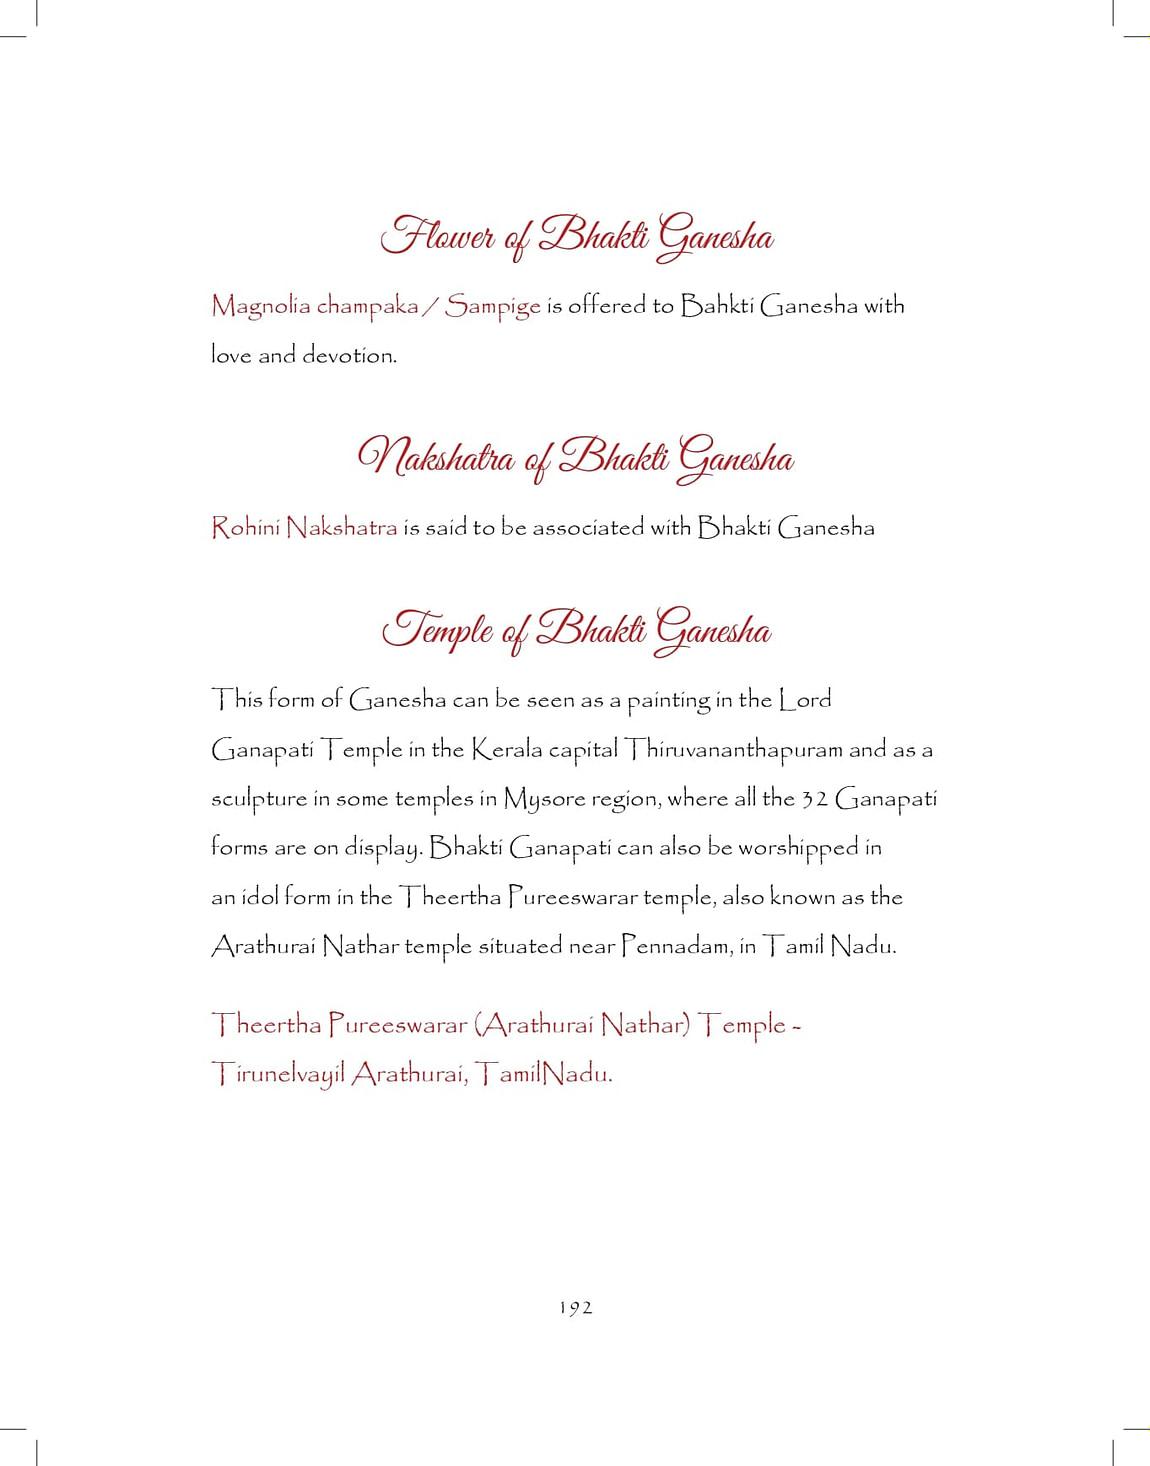 Ganesh-print_pages-to-jpg-0192.jpg